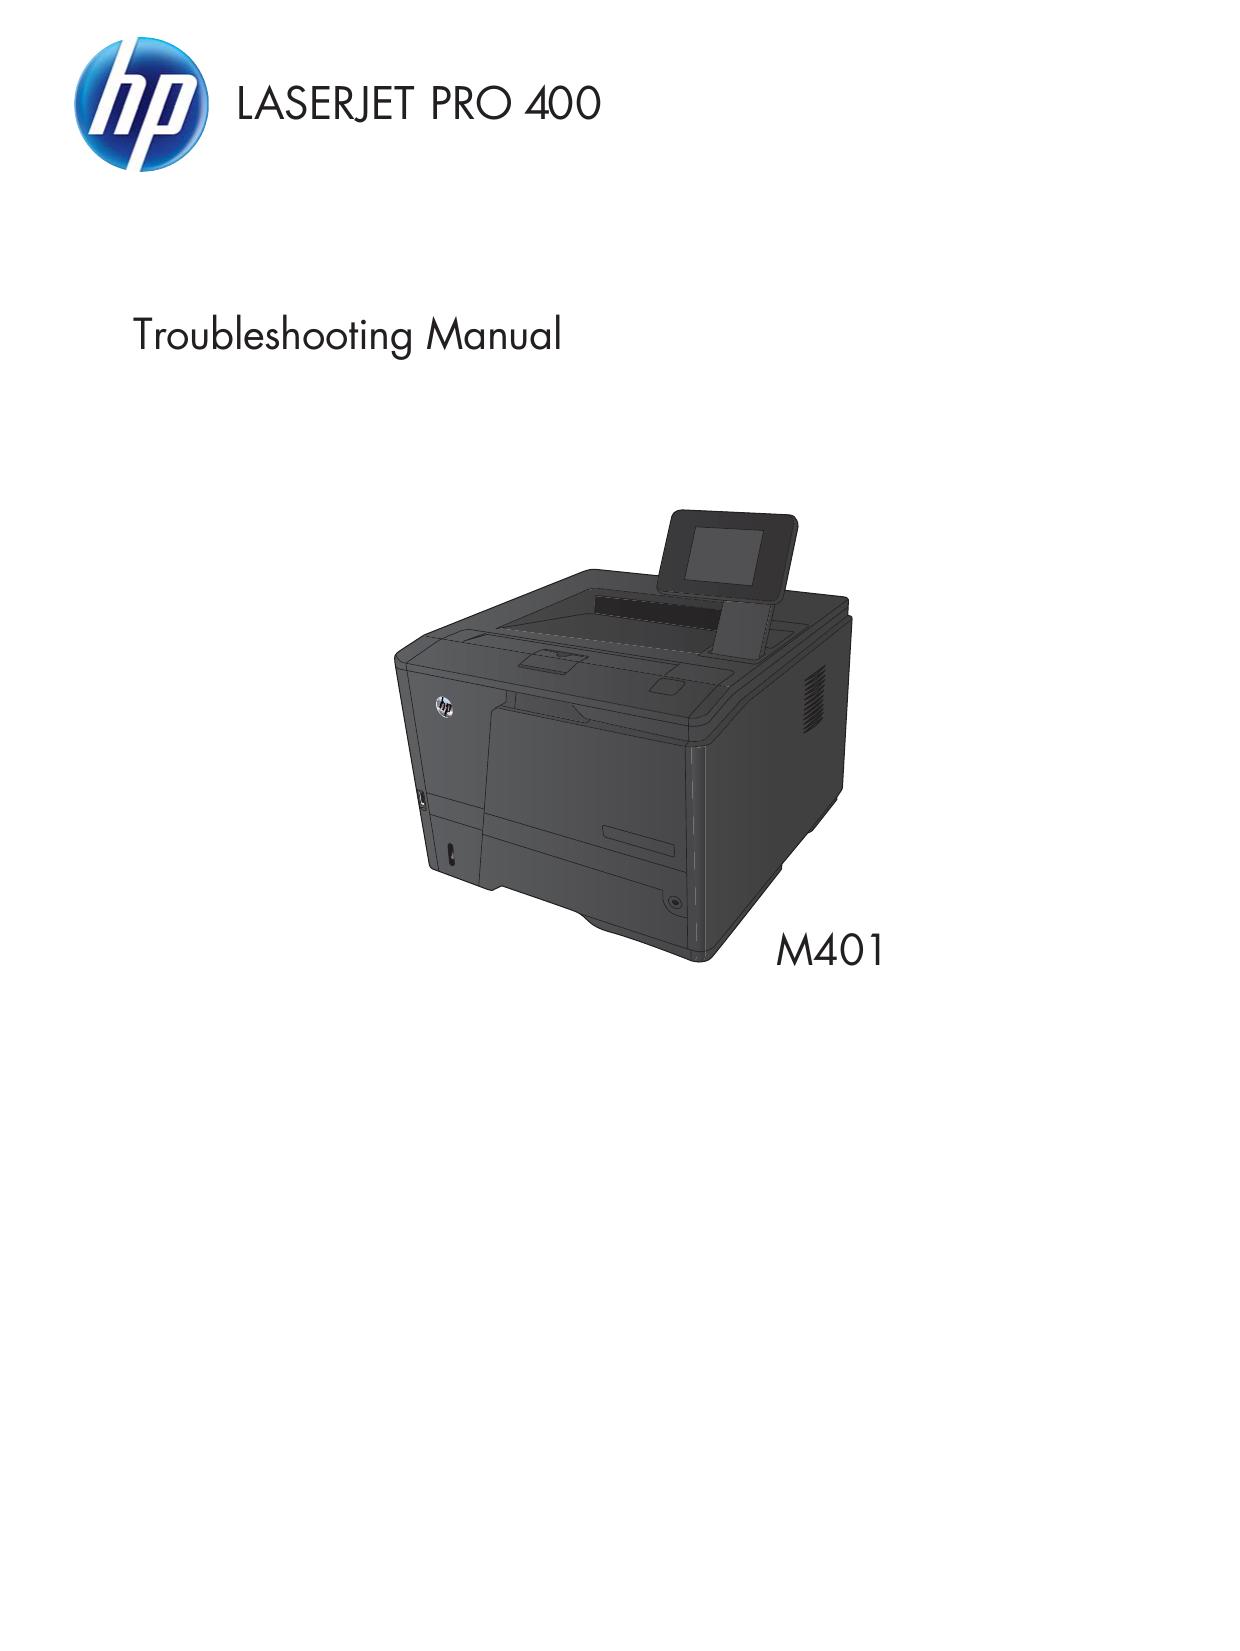 HP LaserJet Pro 400 M401dne M401dw printer AC power supply cord cable charger